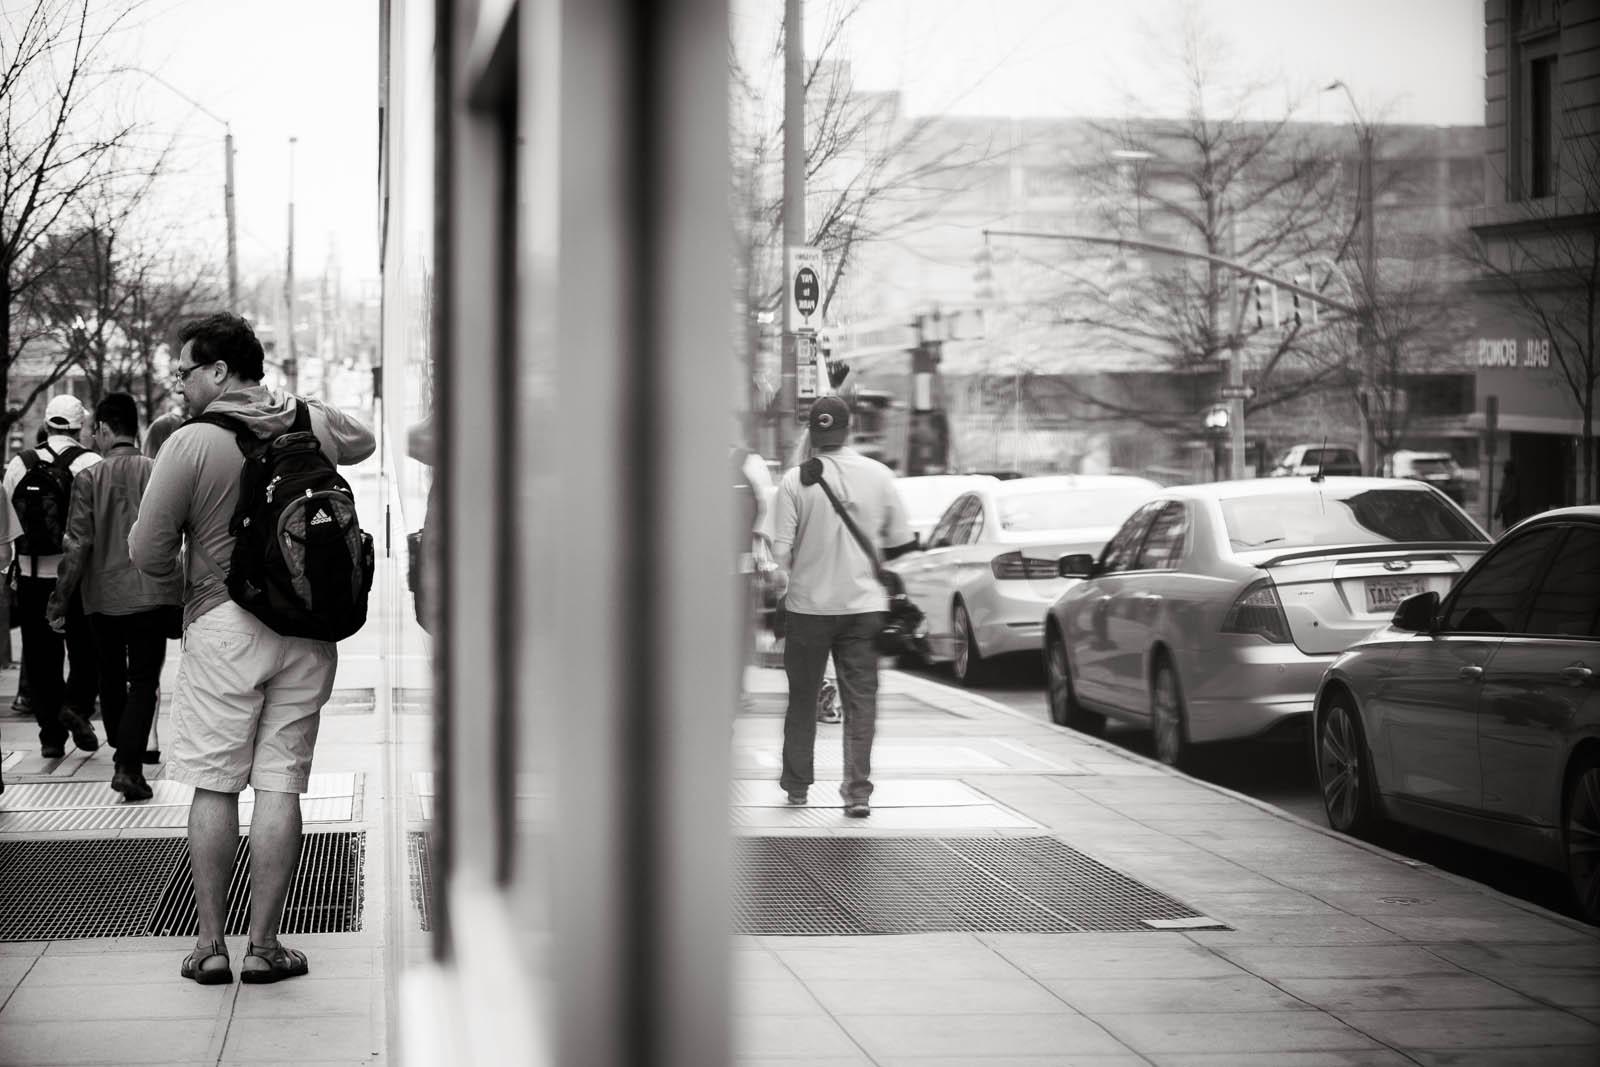 StreetPhotography_DownTownRaleighNC_ErnestoSue-2498.jpg